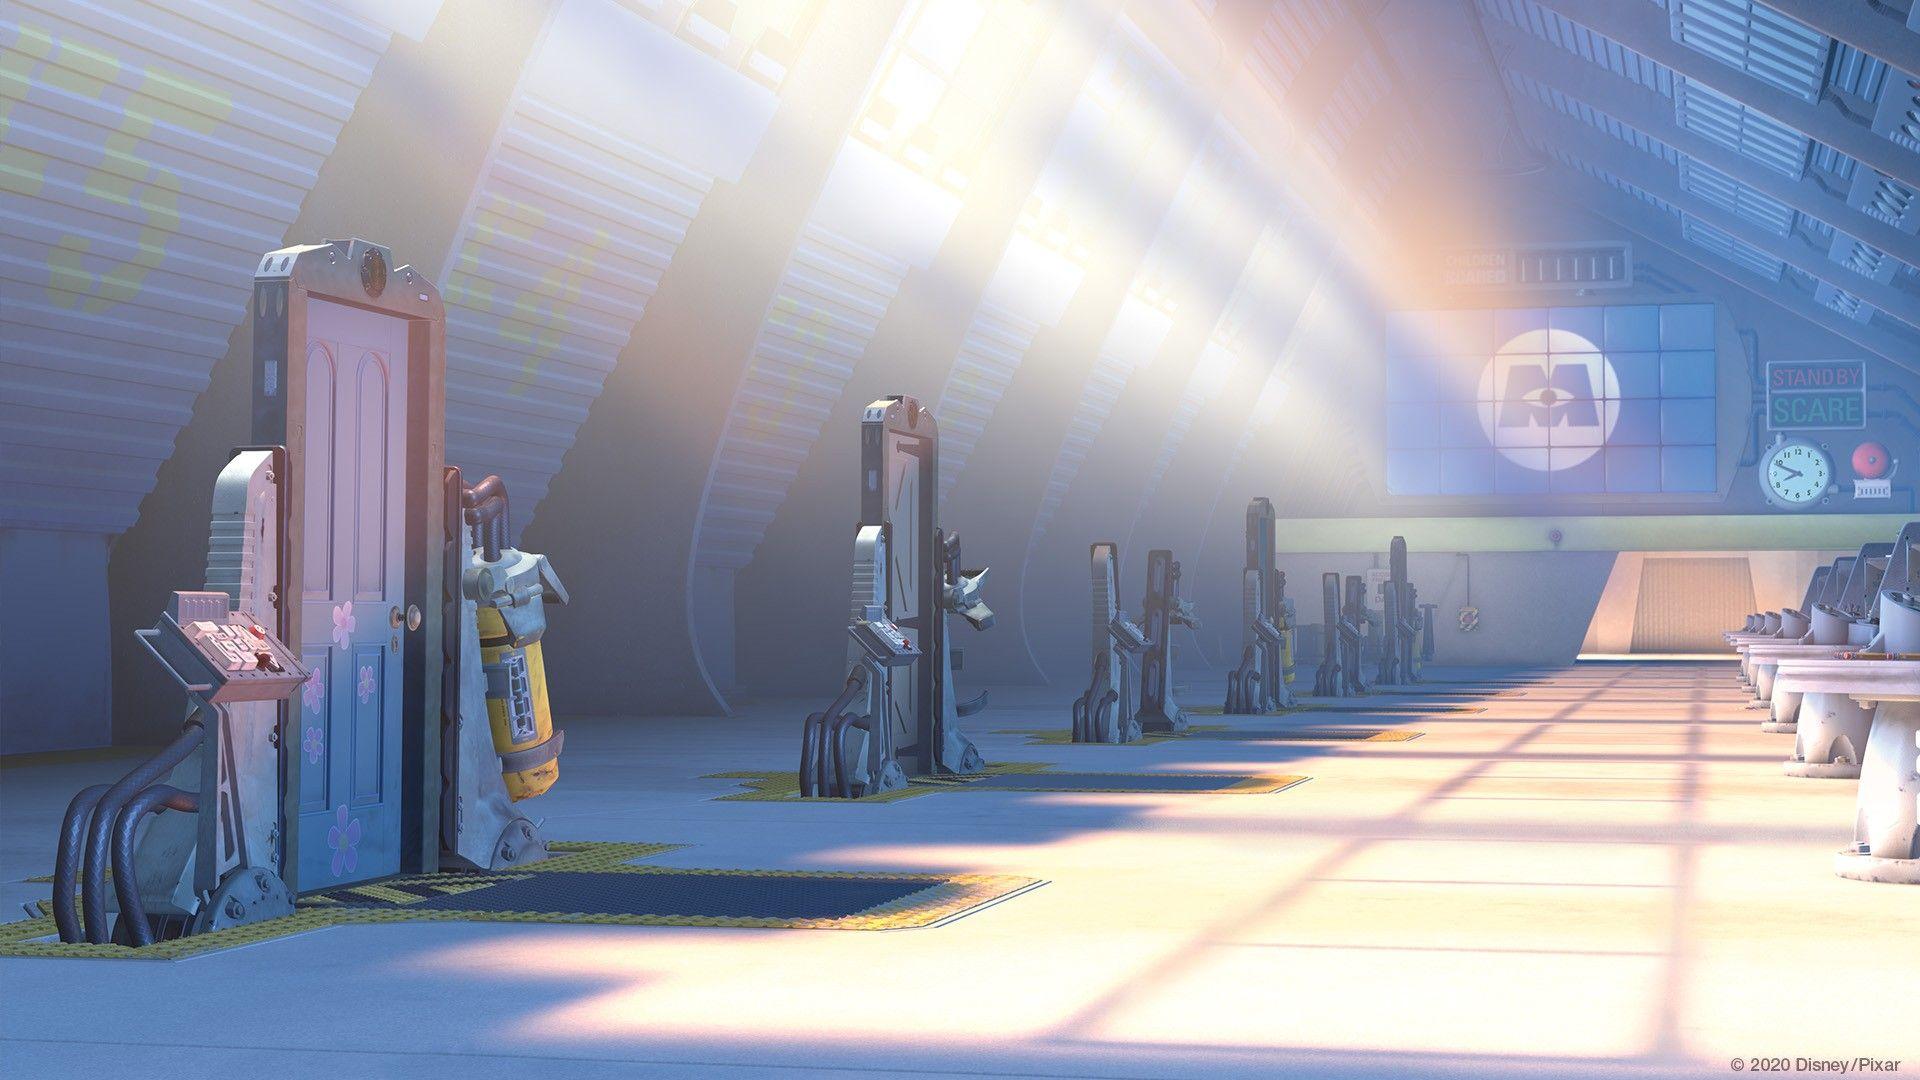 Pin By Jai James On Pixar Animated Universe Disney Background Background Pixar